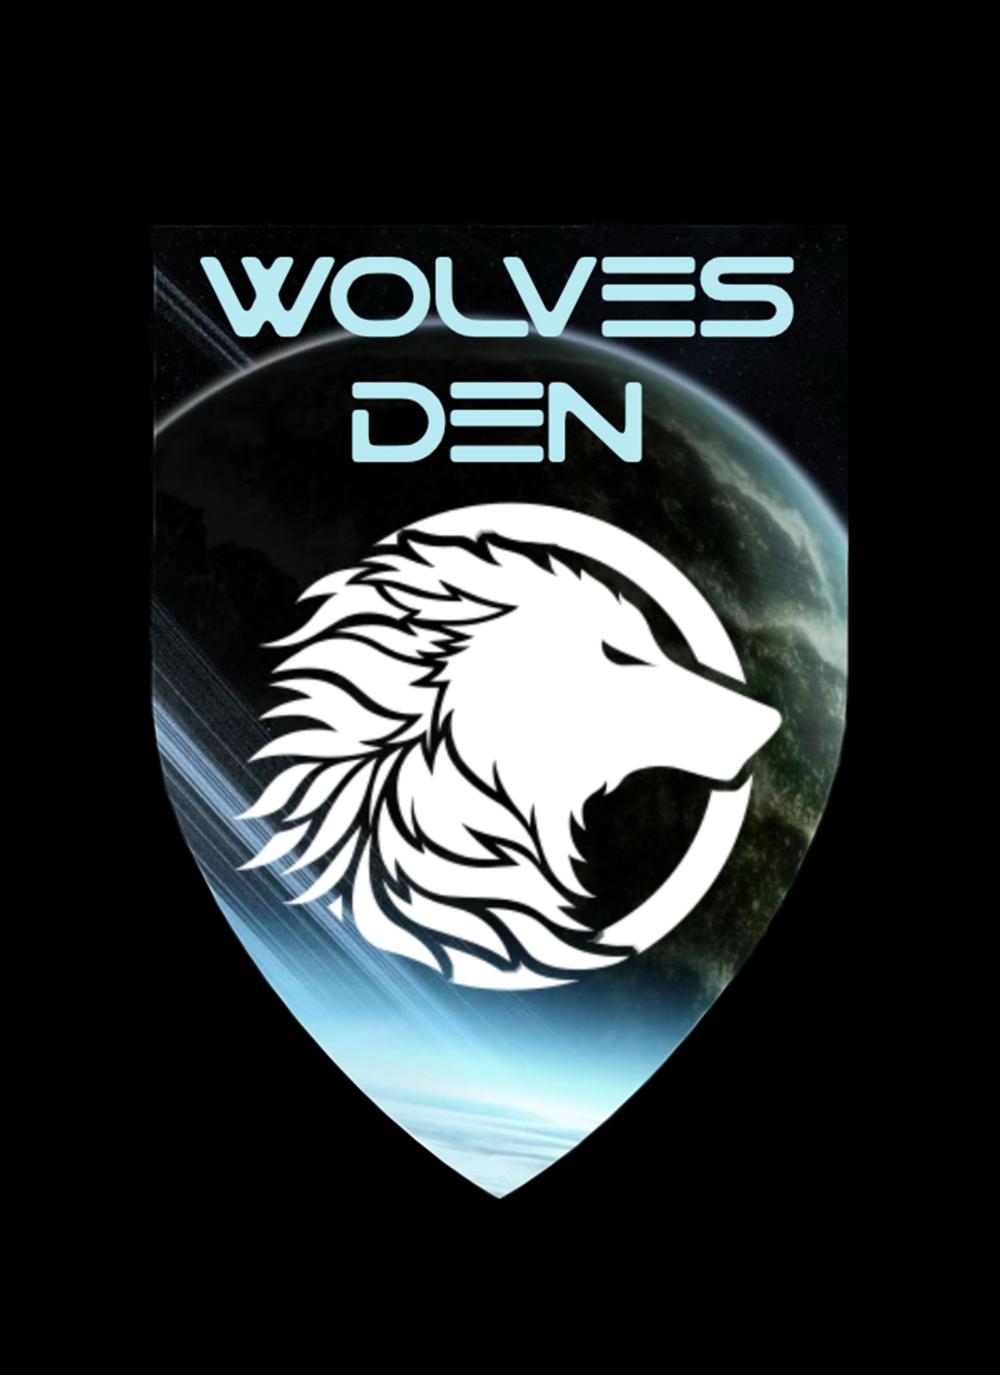 Wolves Den